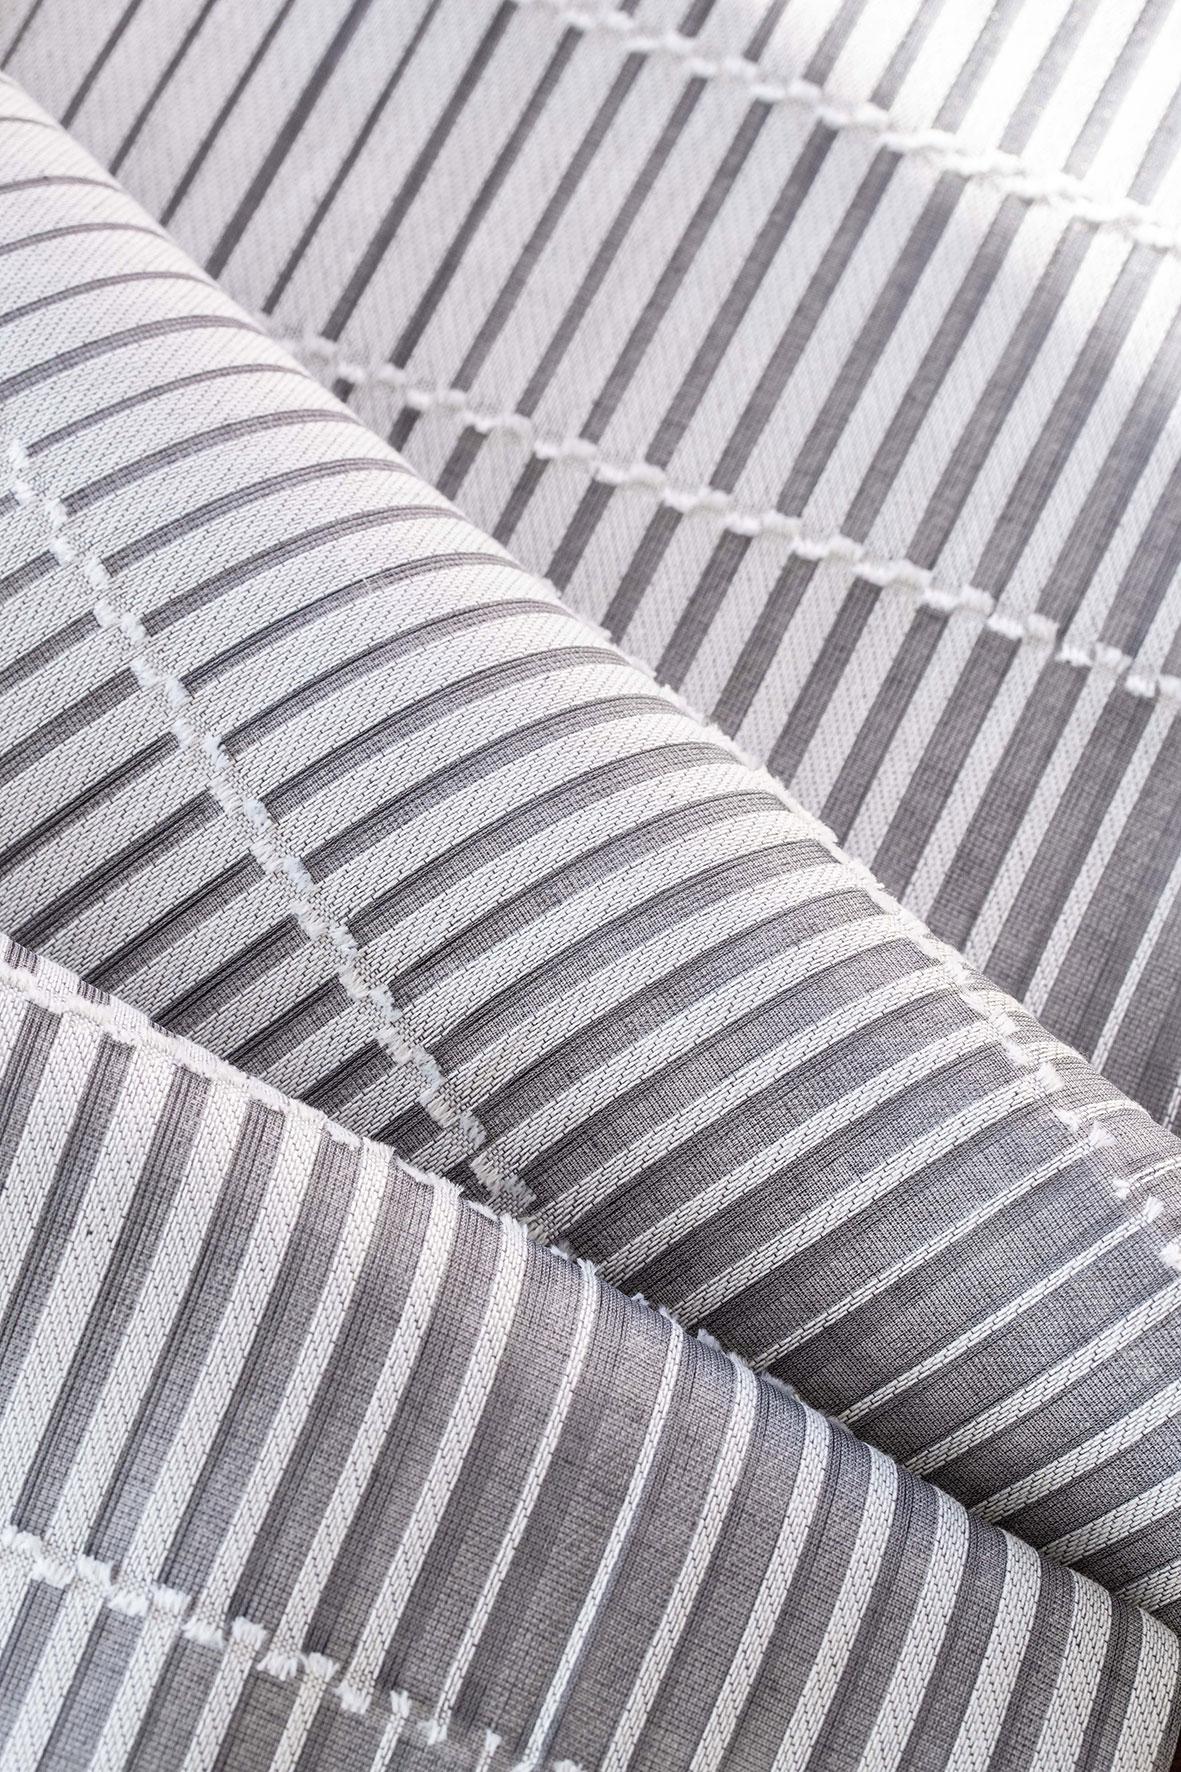 Rasch_Textil_Fjord_Detail.jpg